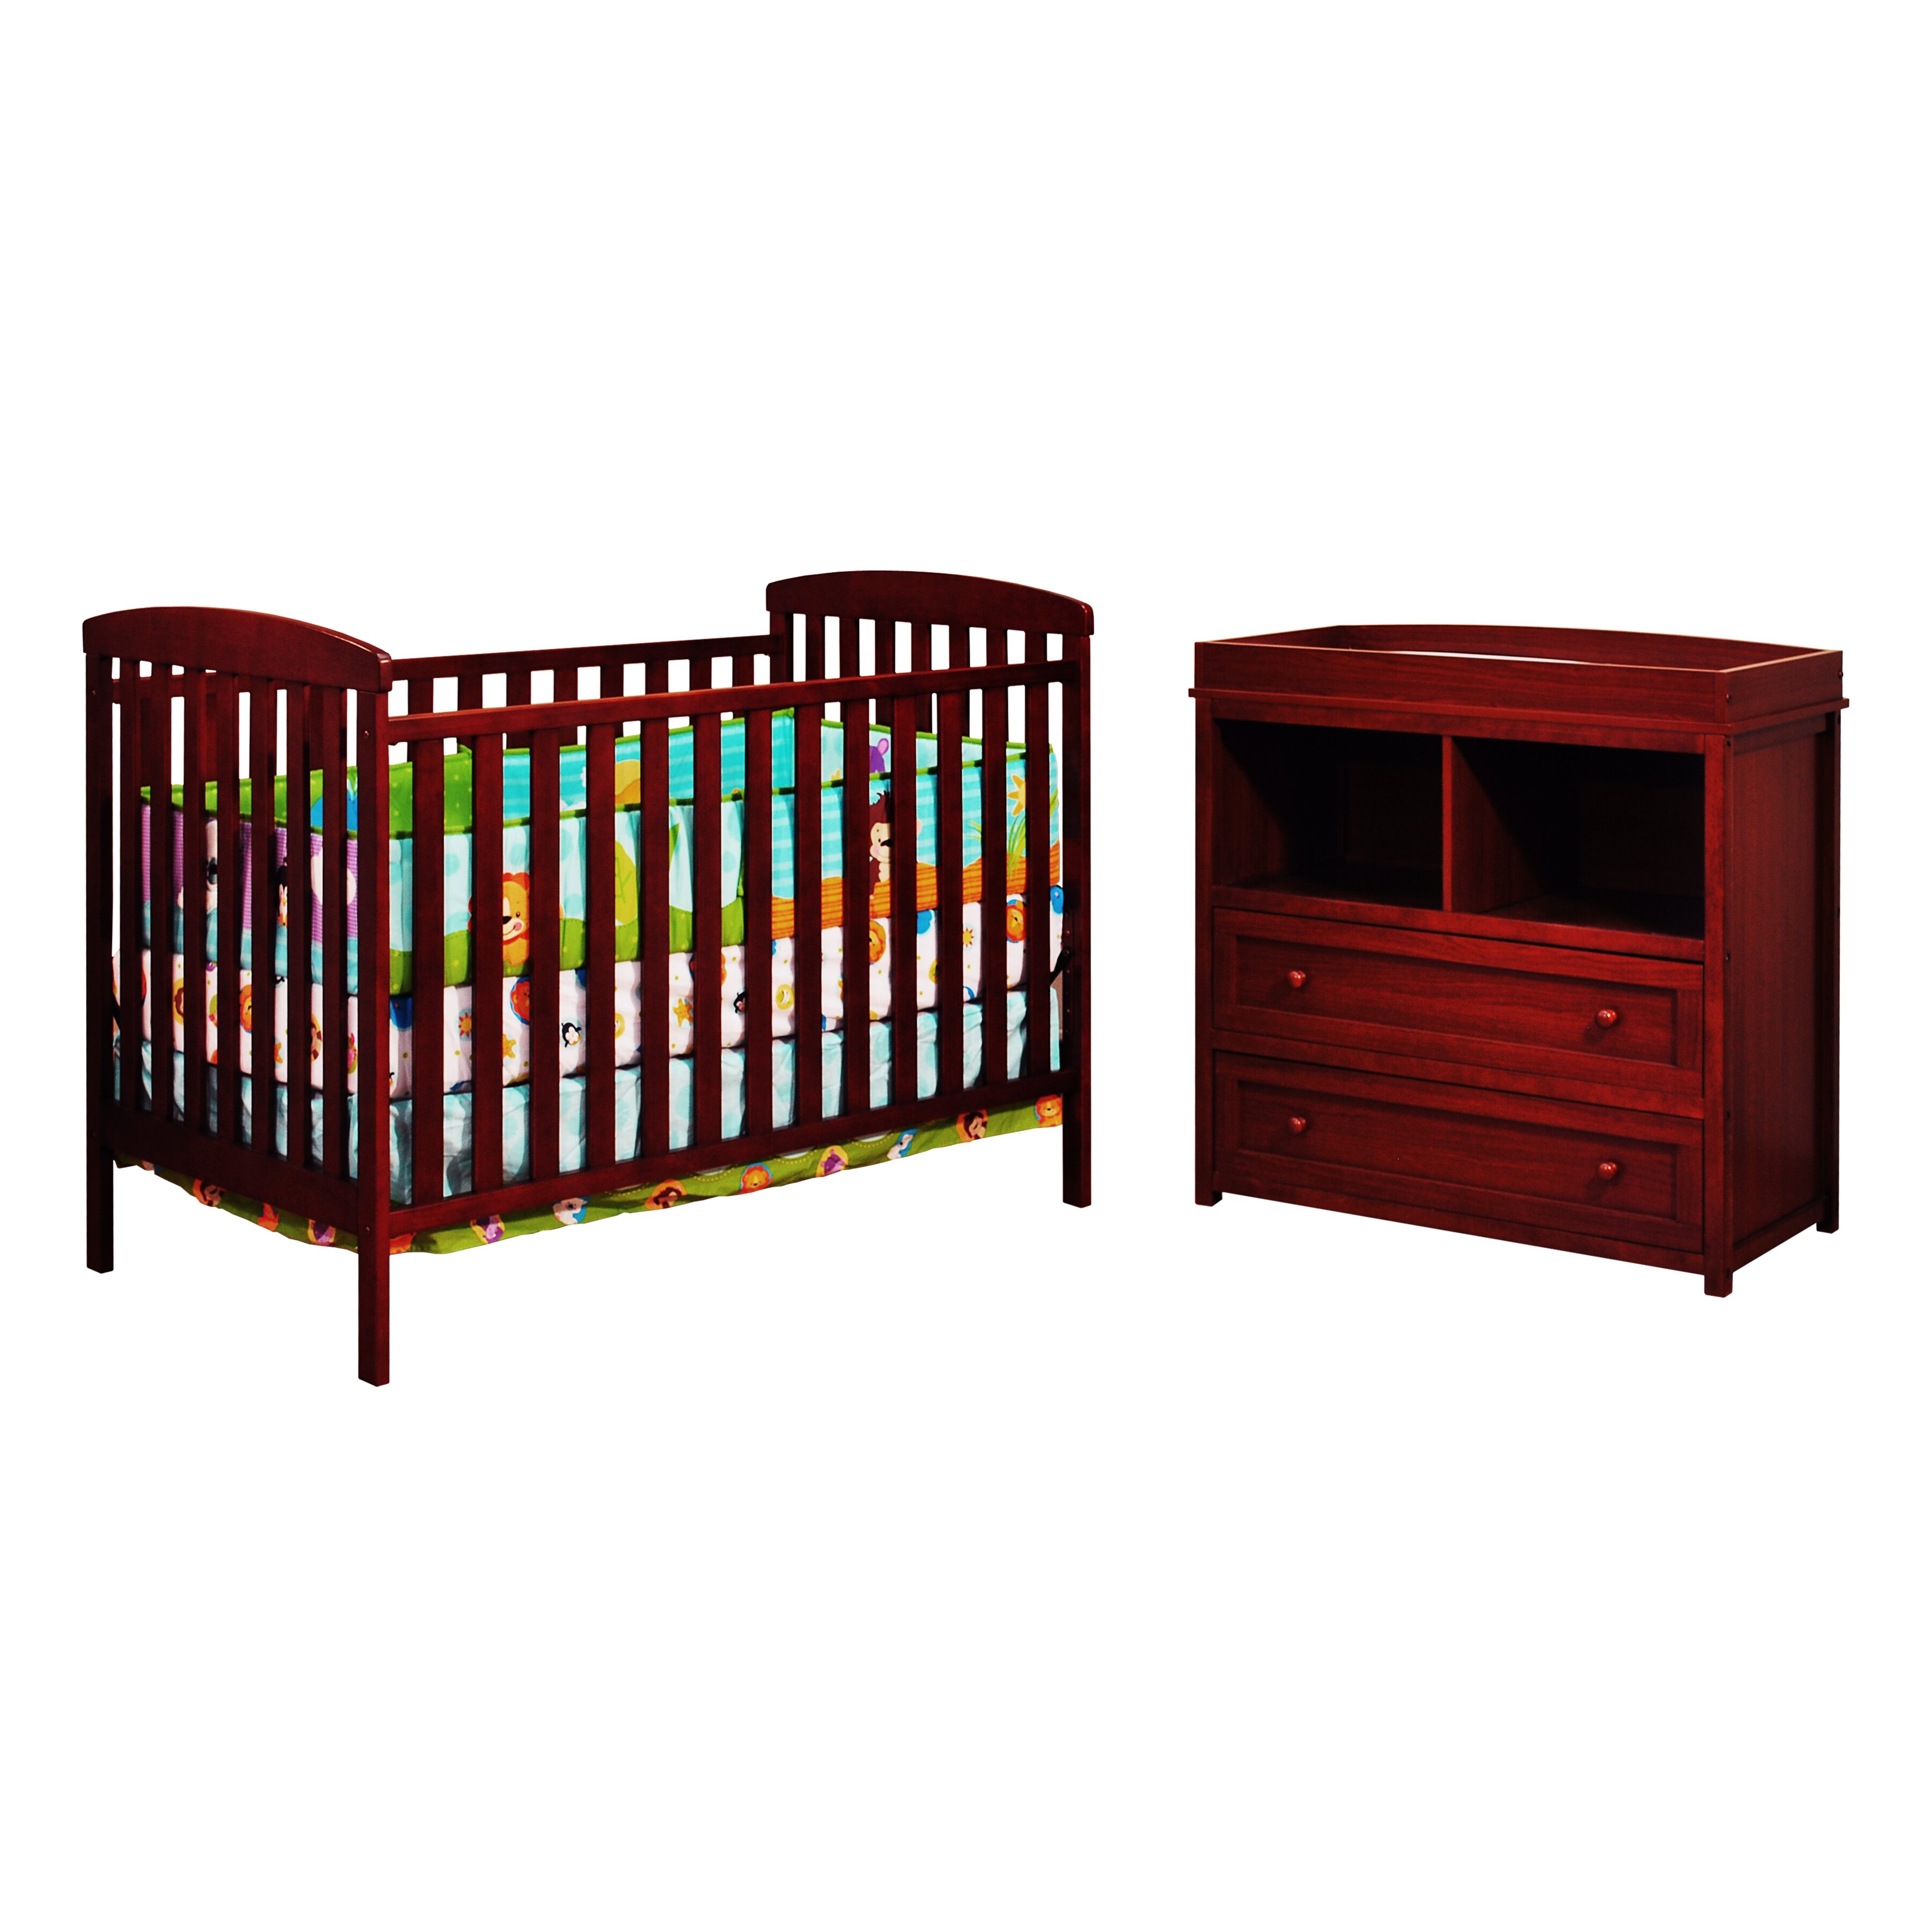 afg international furniture leila 2 crib set